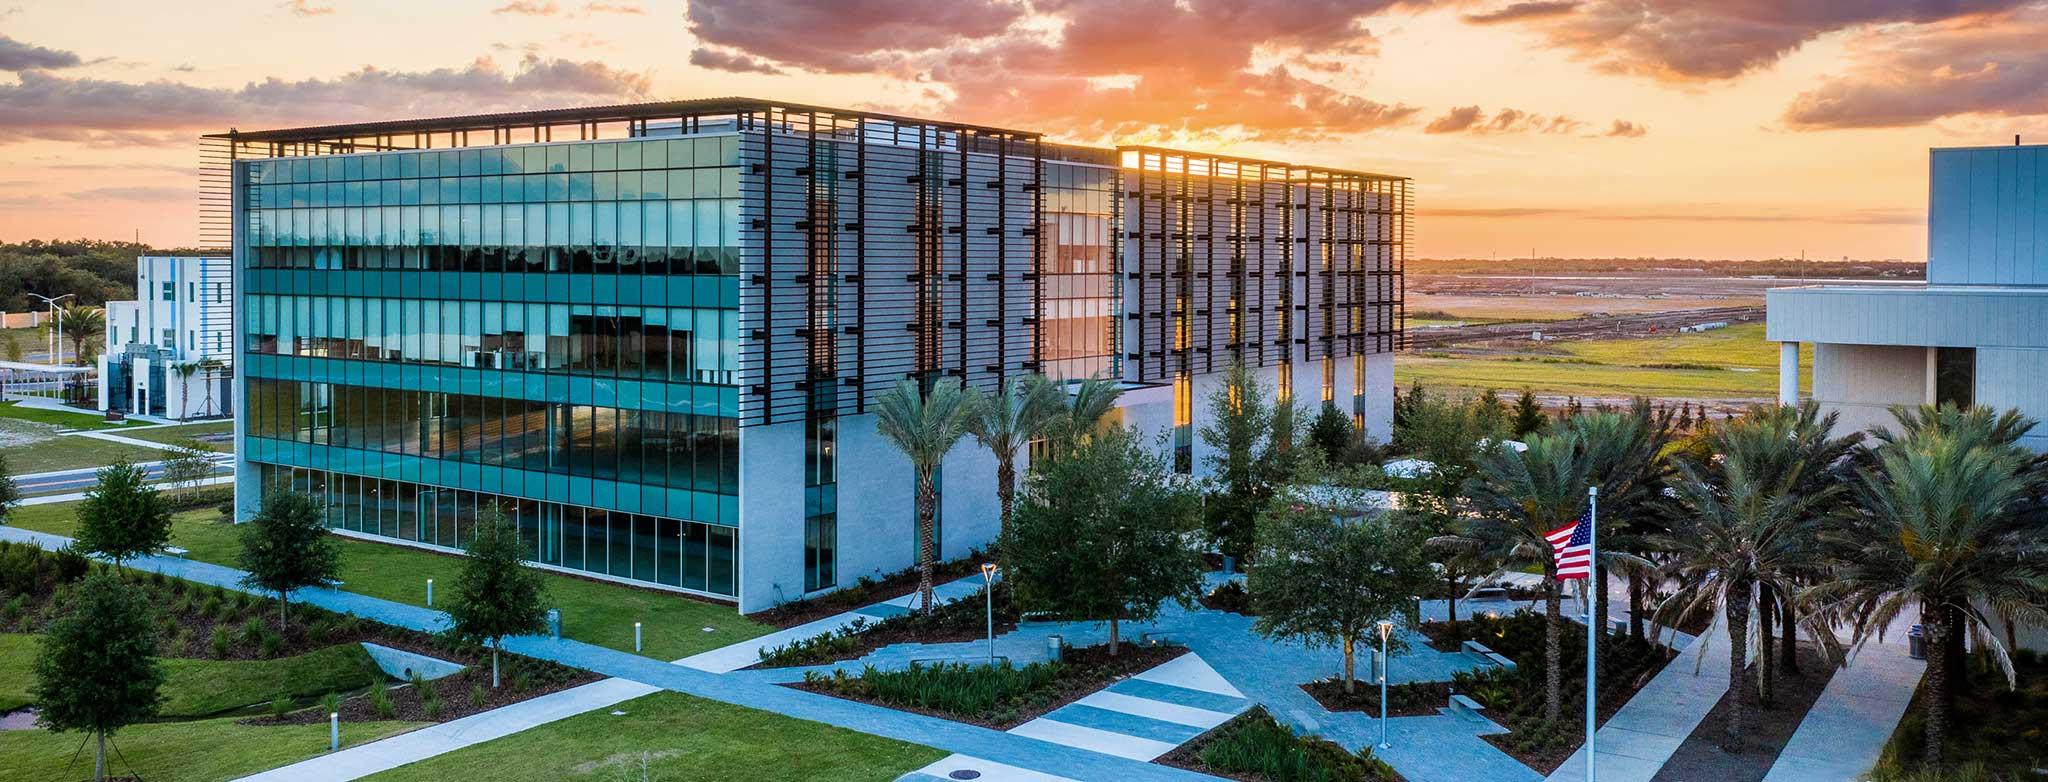 NeoCity Office Building